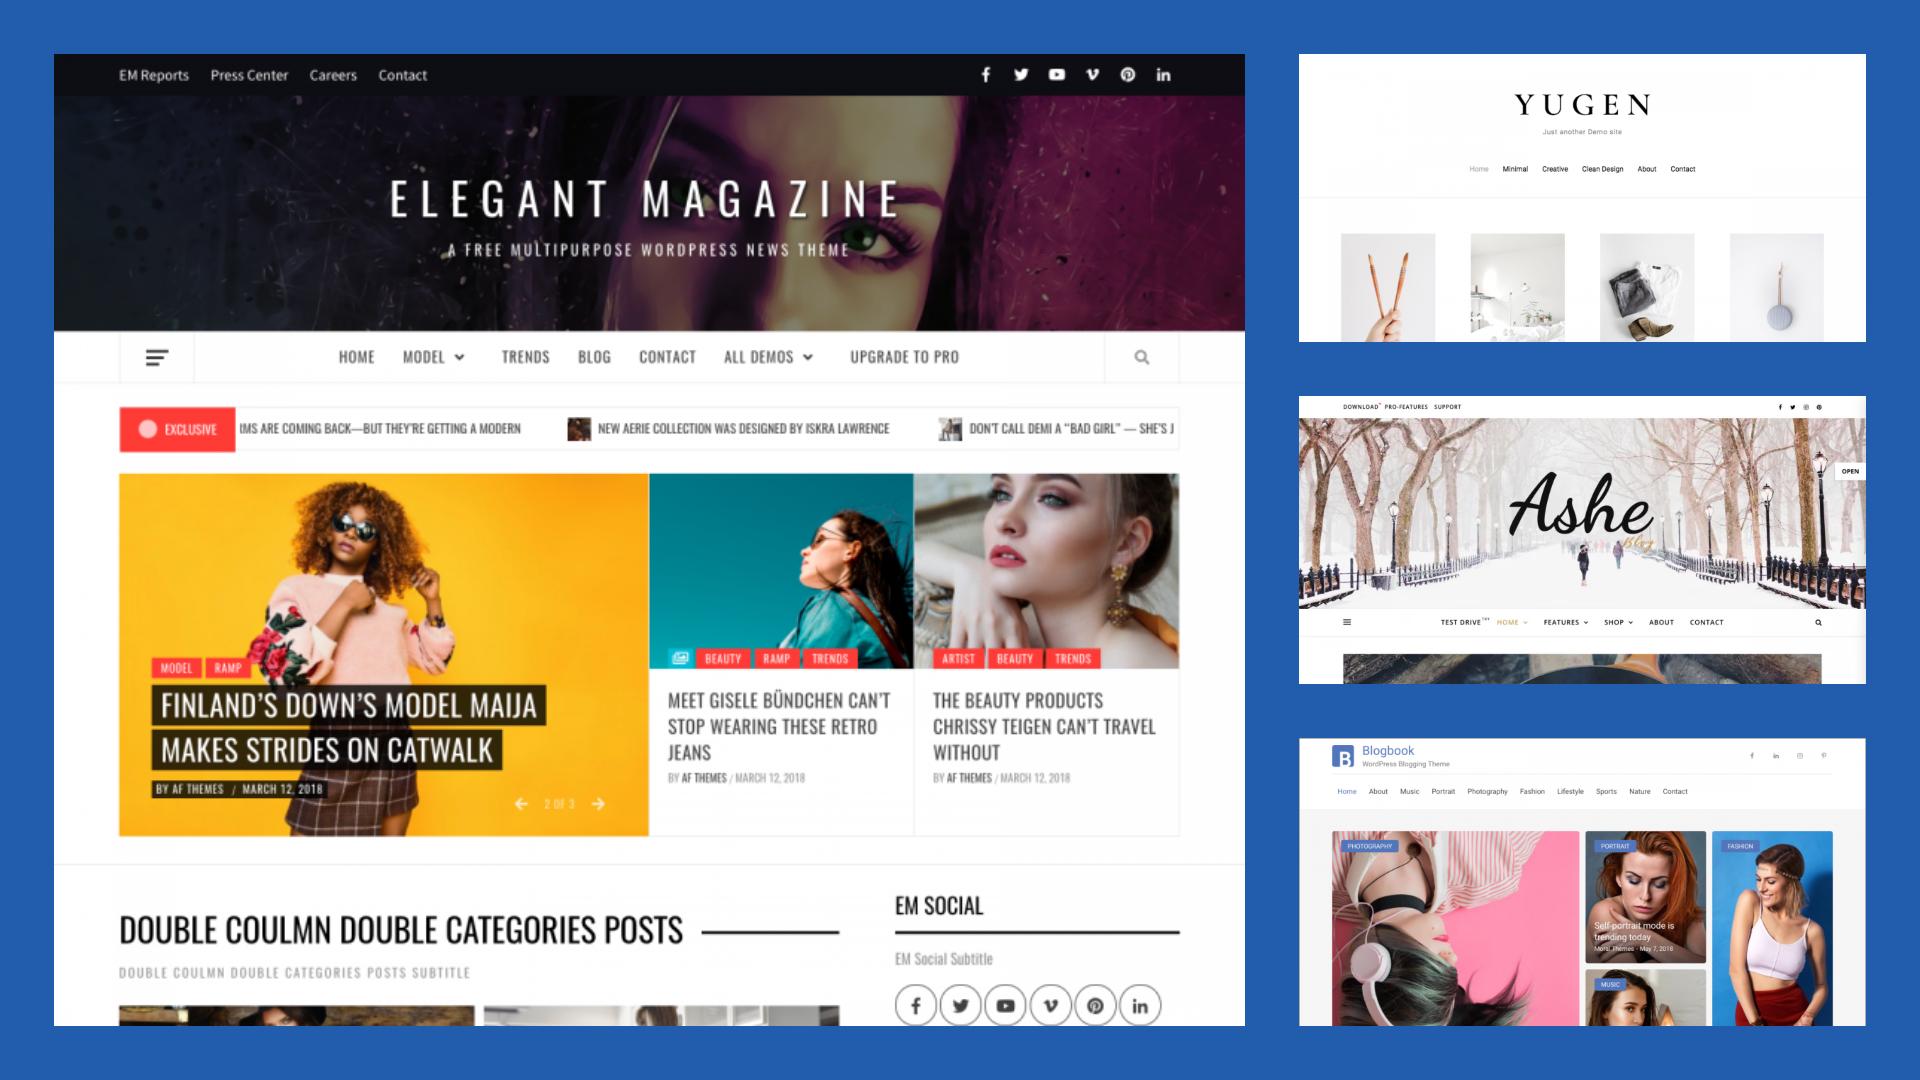 TOP 10 Free Magazine WordPress Themes in 2018